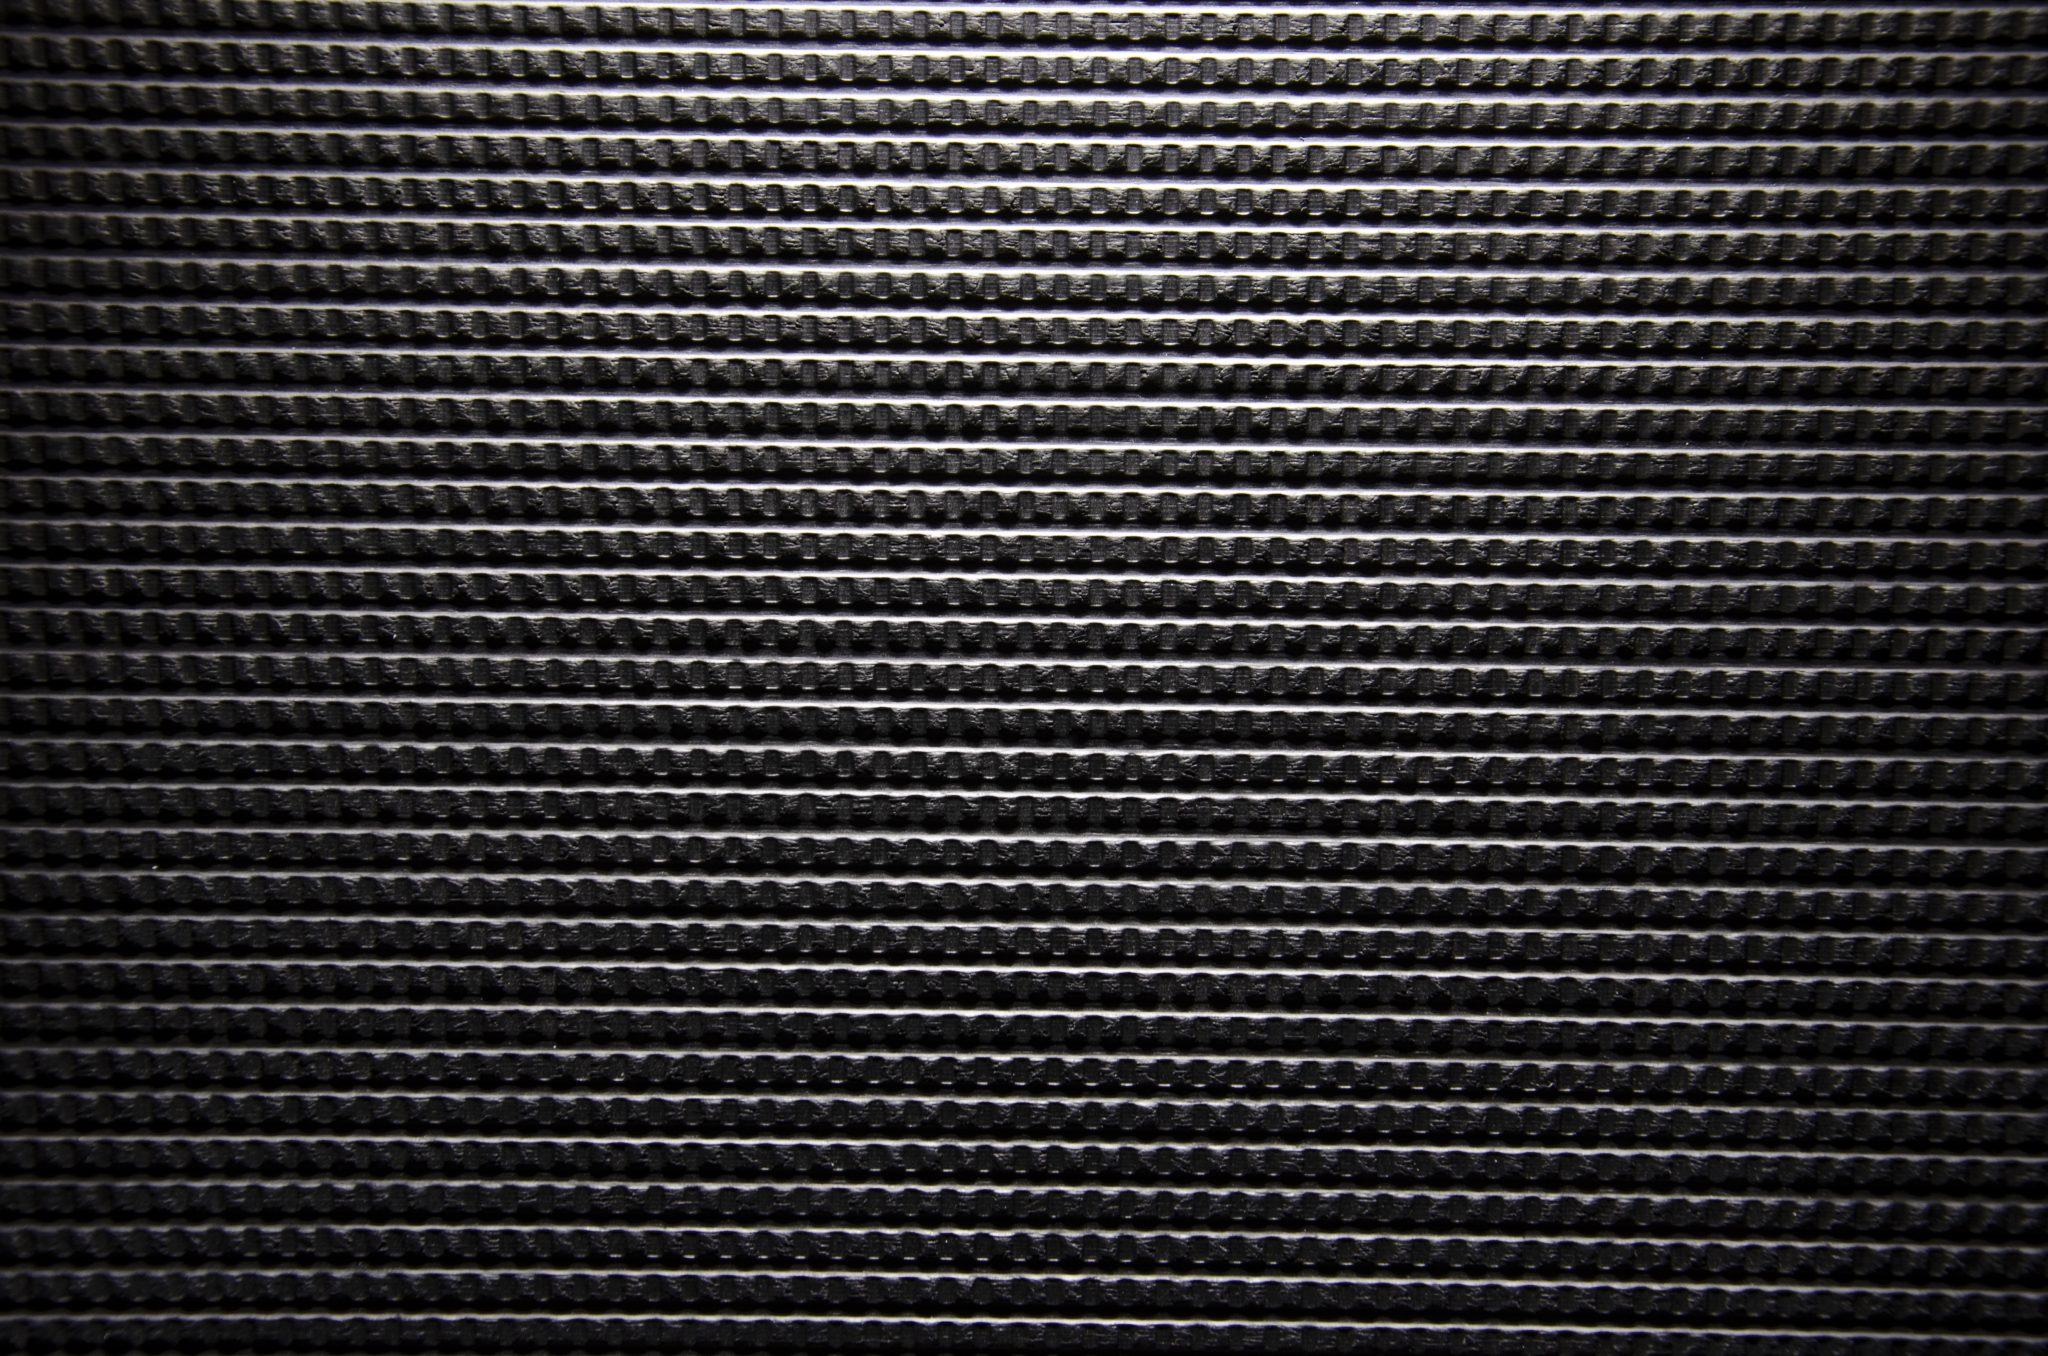 2555 - HUFNAGEL - Black - Alpi veneer